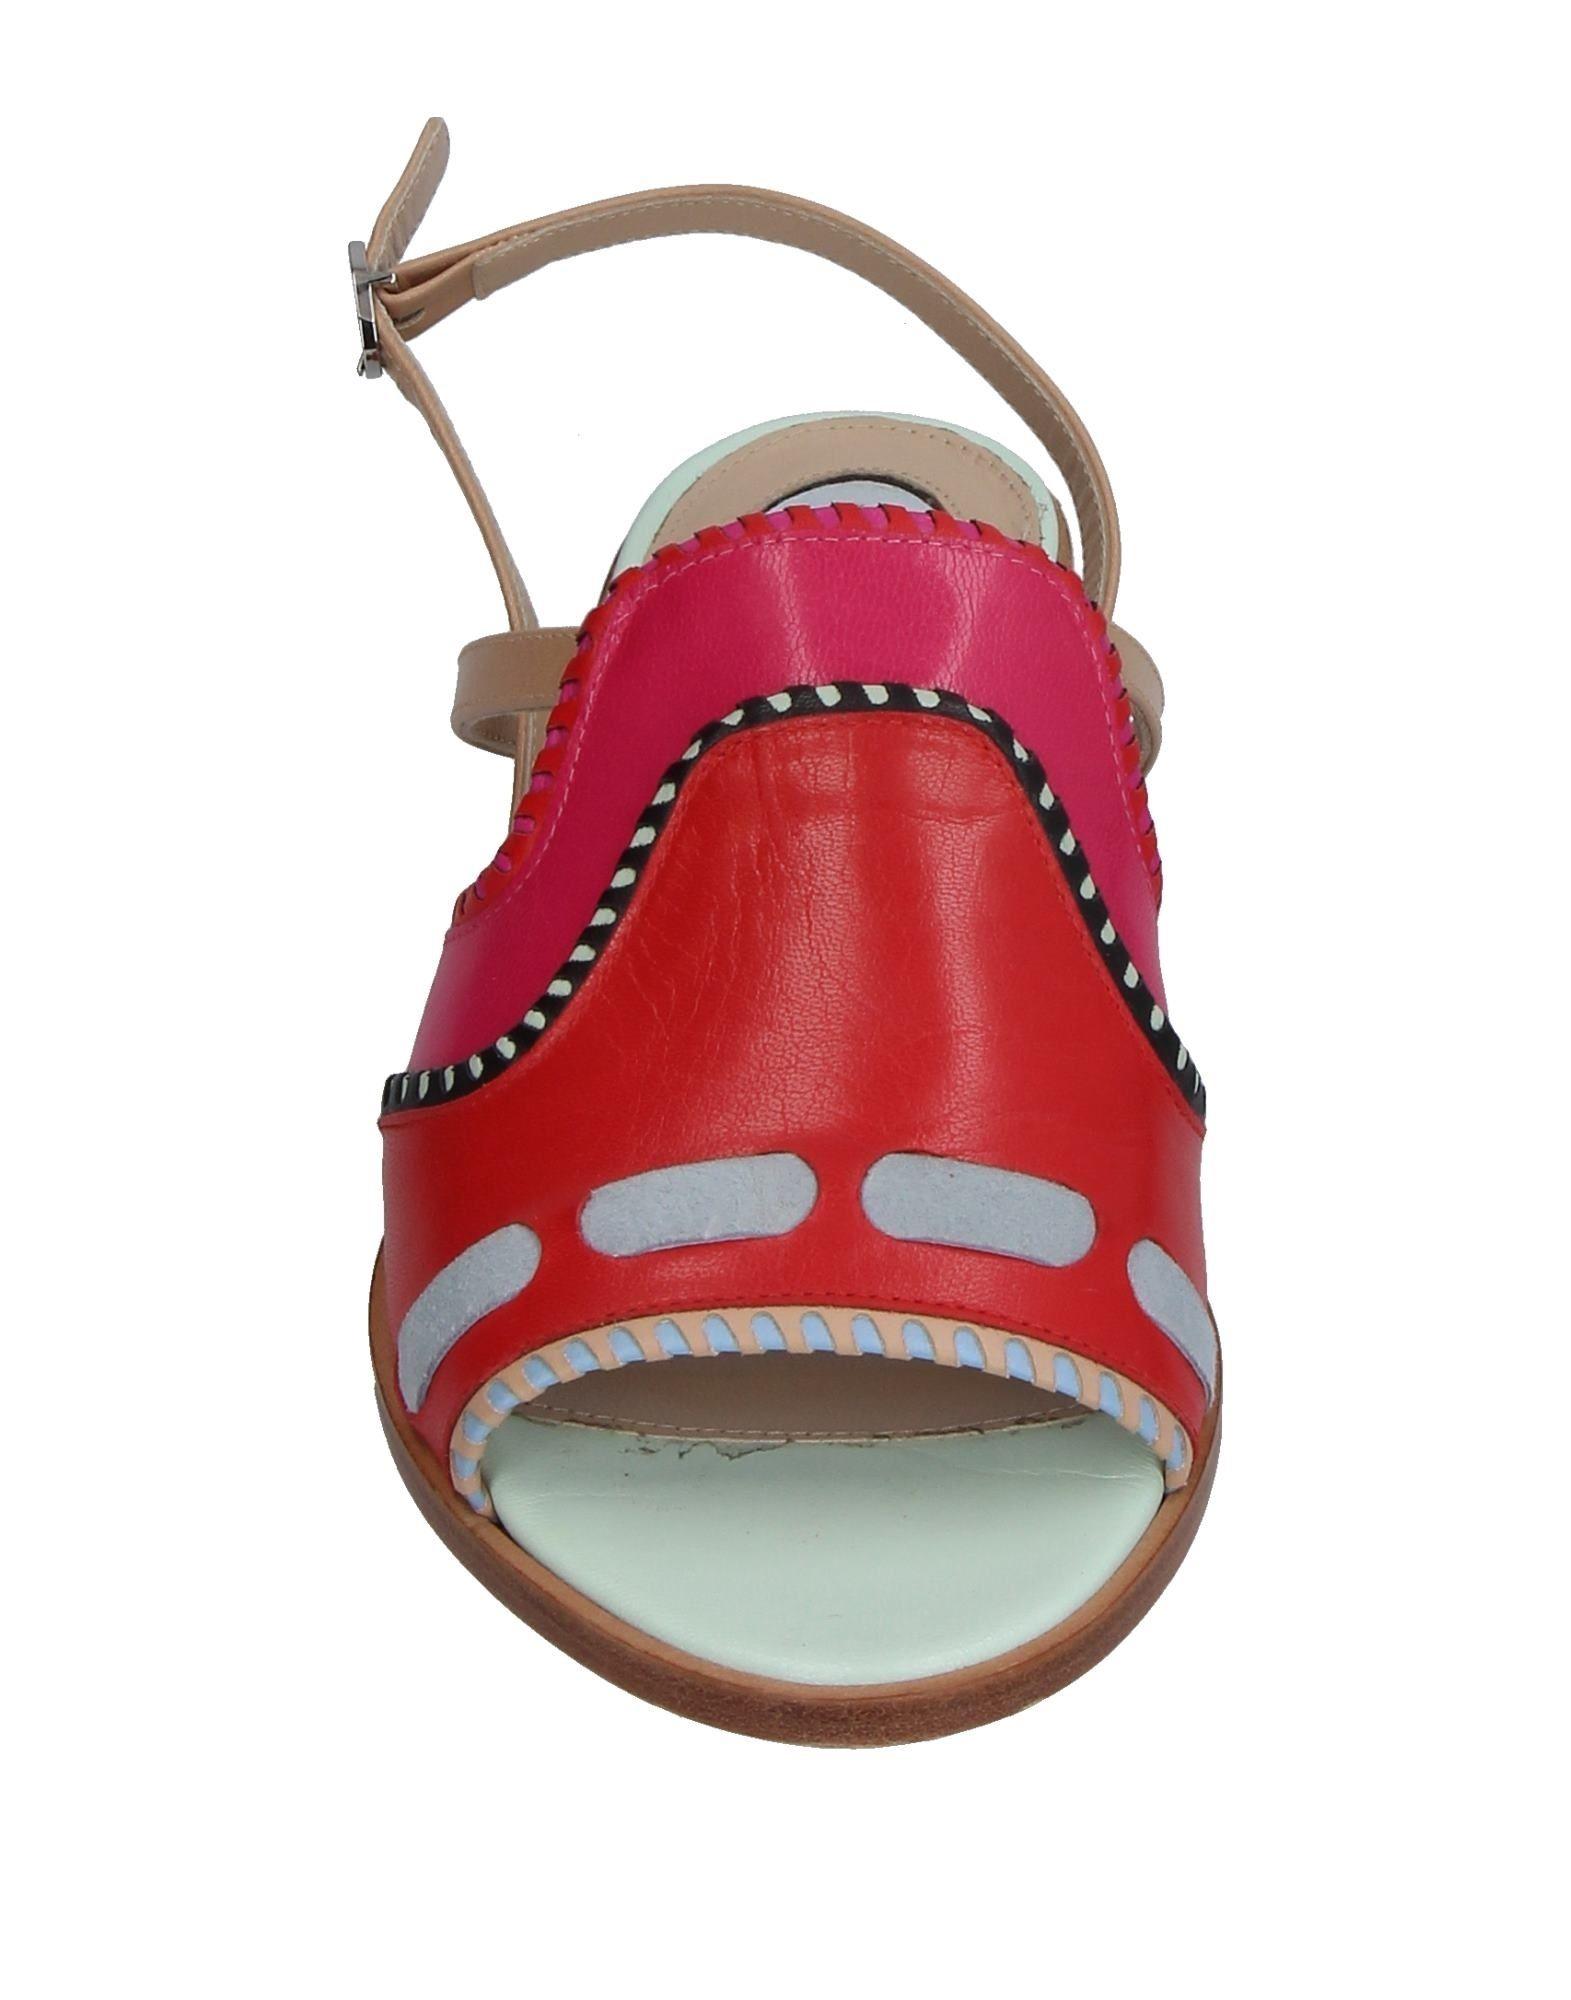 paula cademartori cademartori paula sandales - femmes paula cademartori 11338252rp sandales en ligne le royaume - uni - 8b93ee